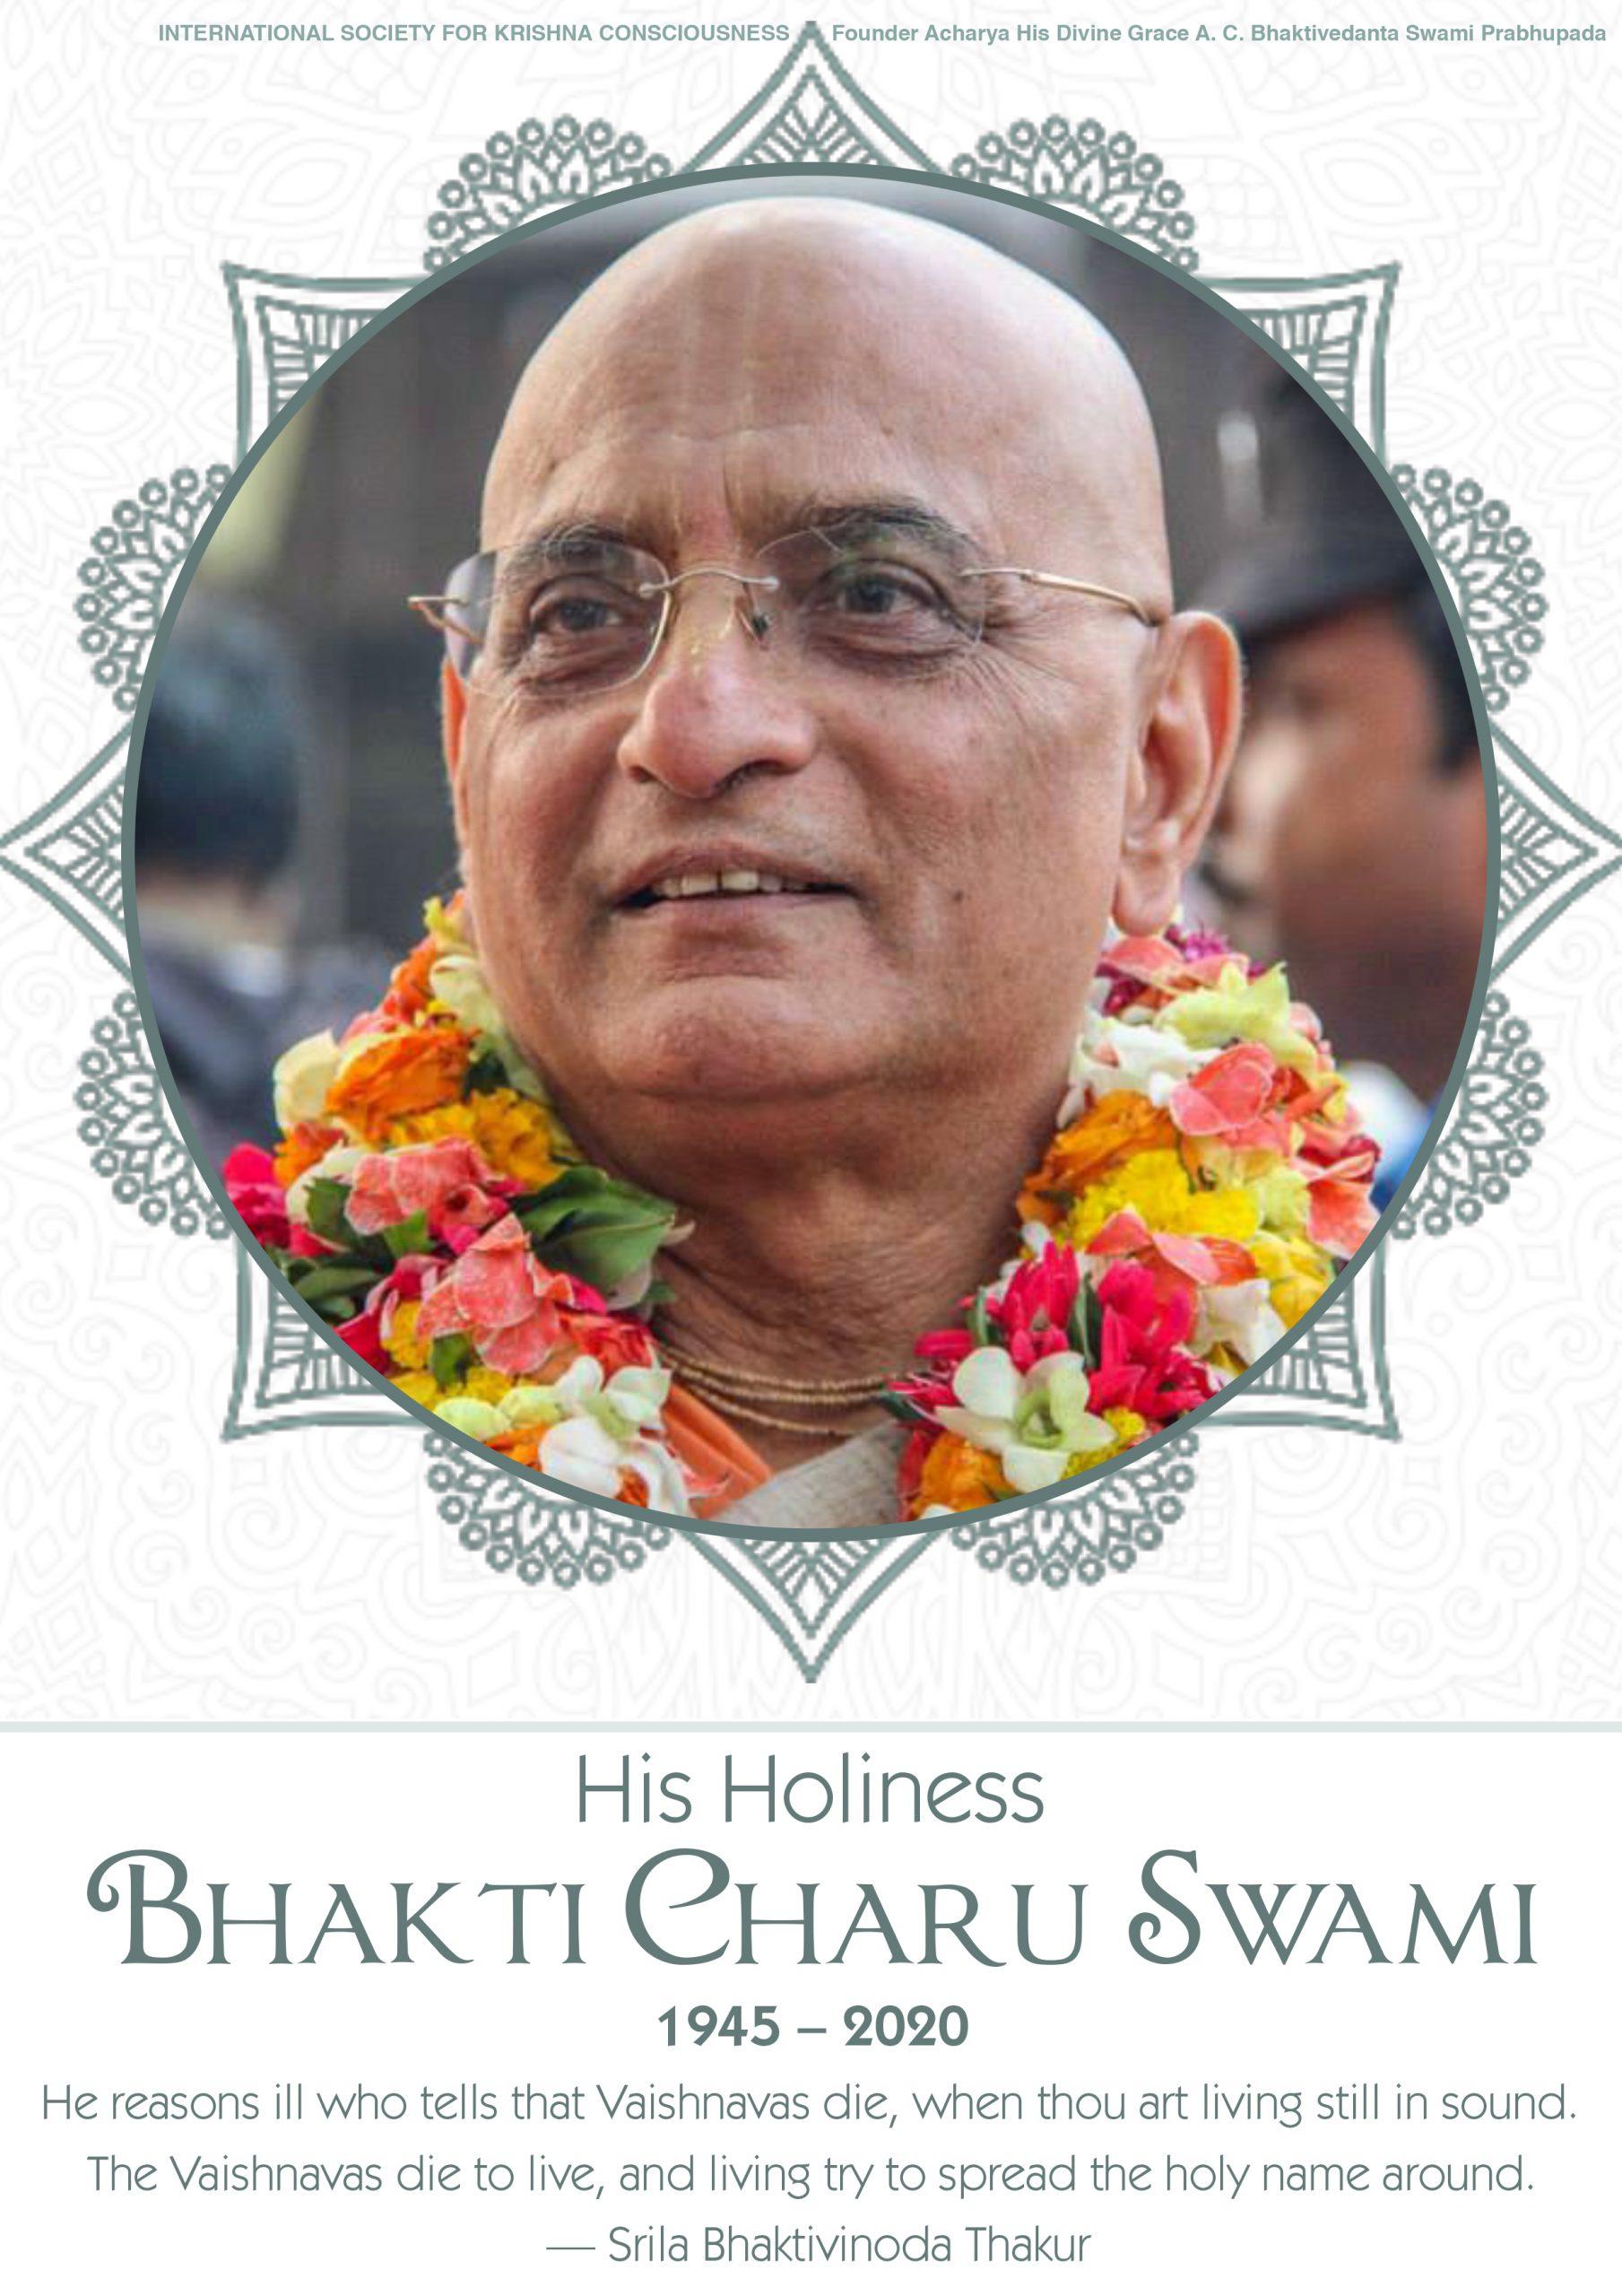 Tributes to His Holiness Bhakti Charu Swami